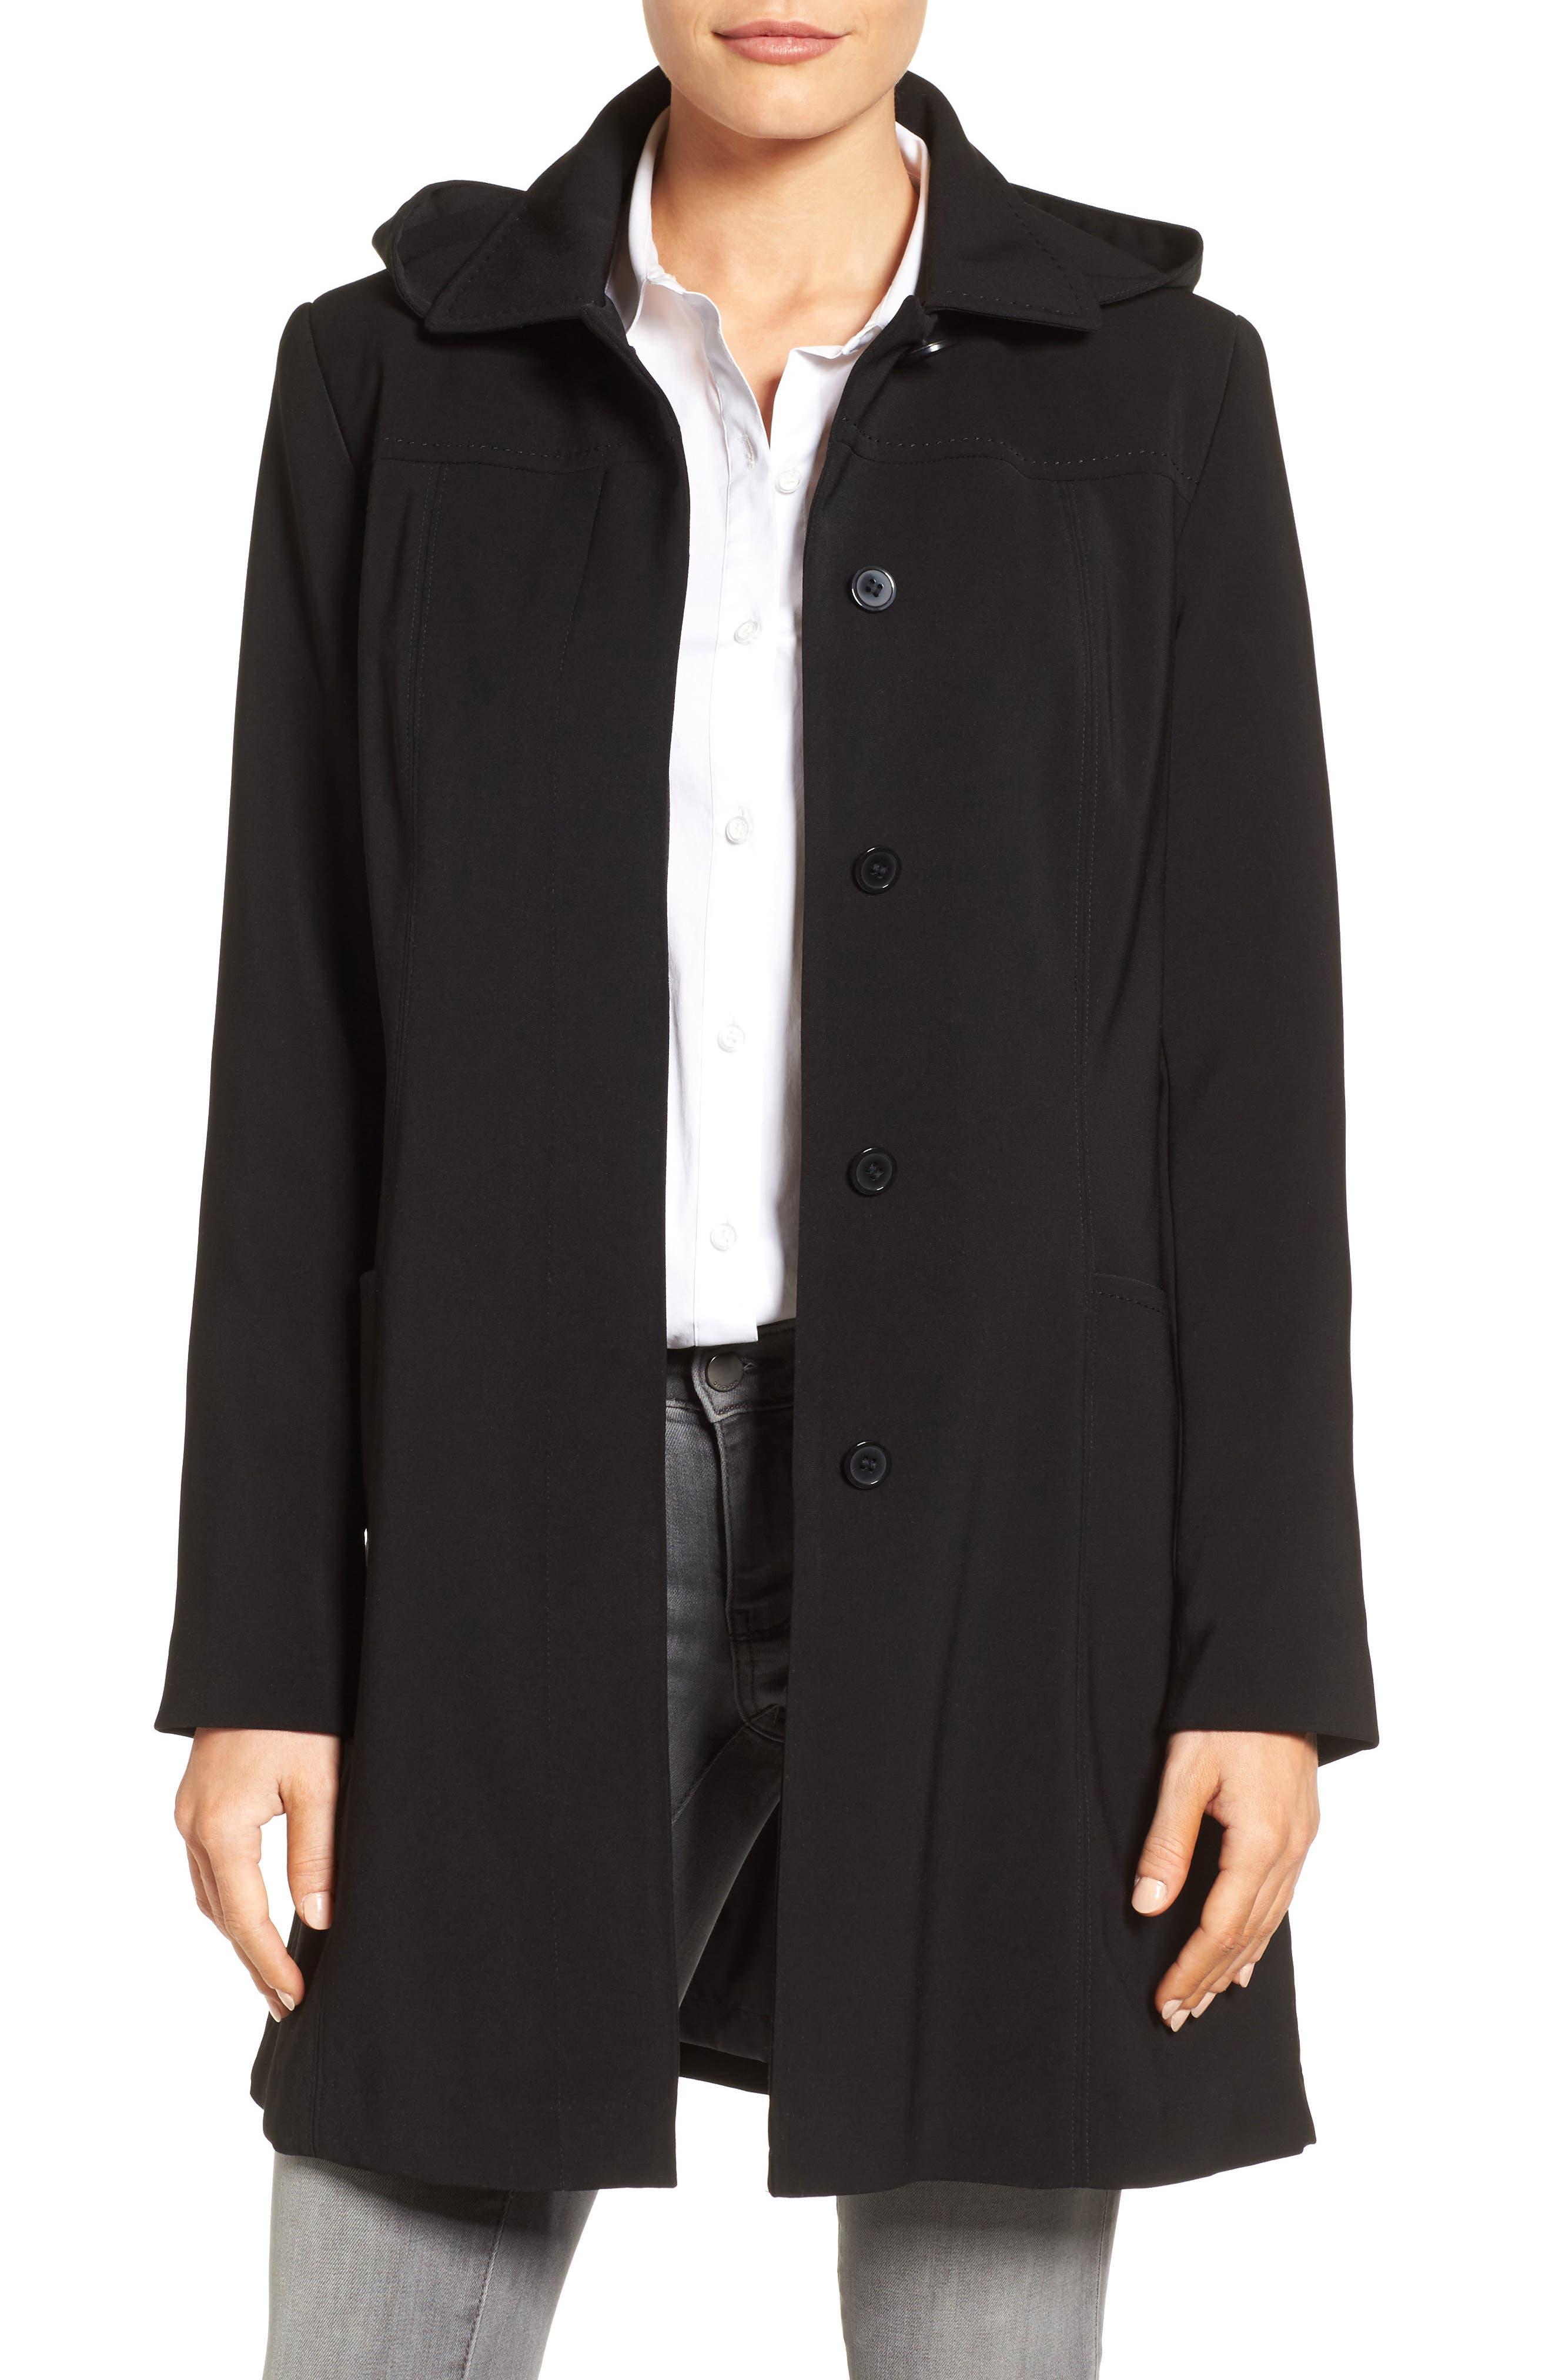 Main Image - Gallery Pickstitch Nepage Walking Coat with Detachable Hood (Regular & Petite)